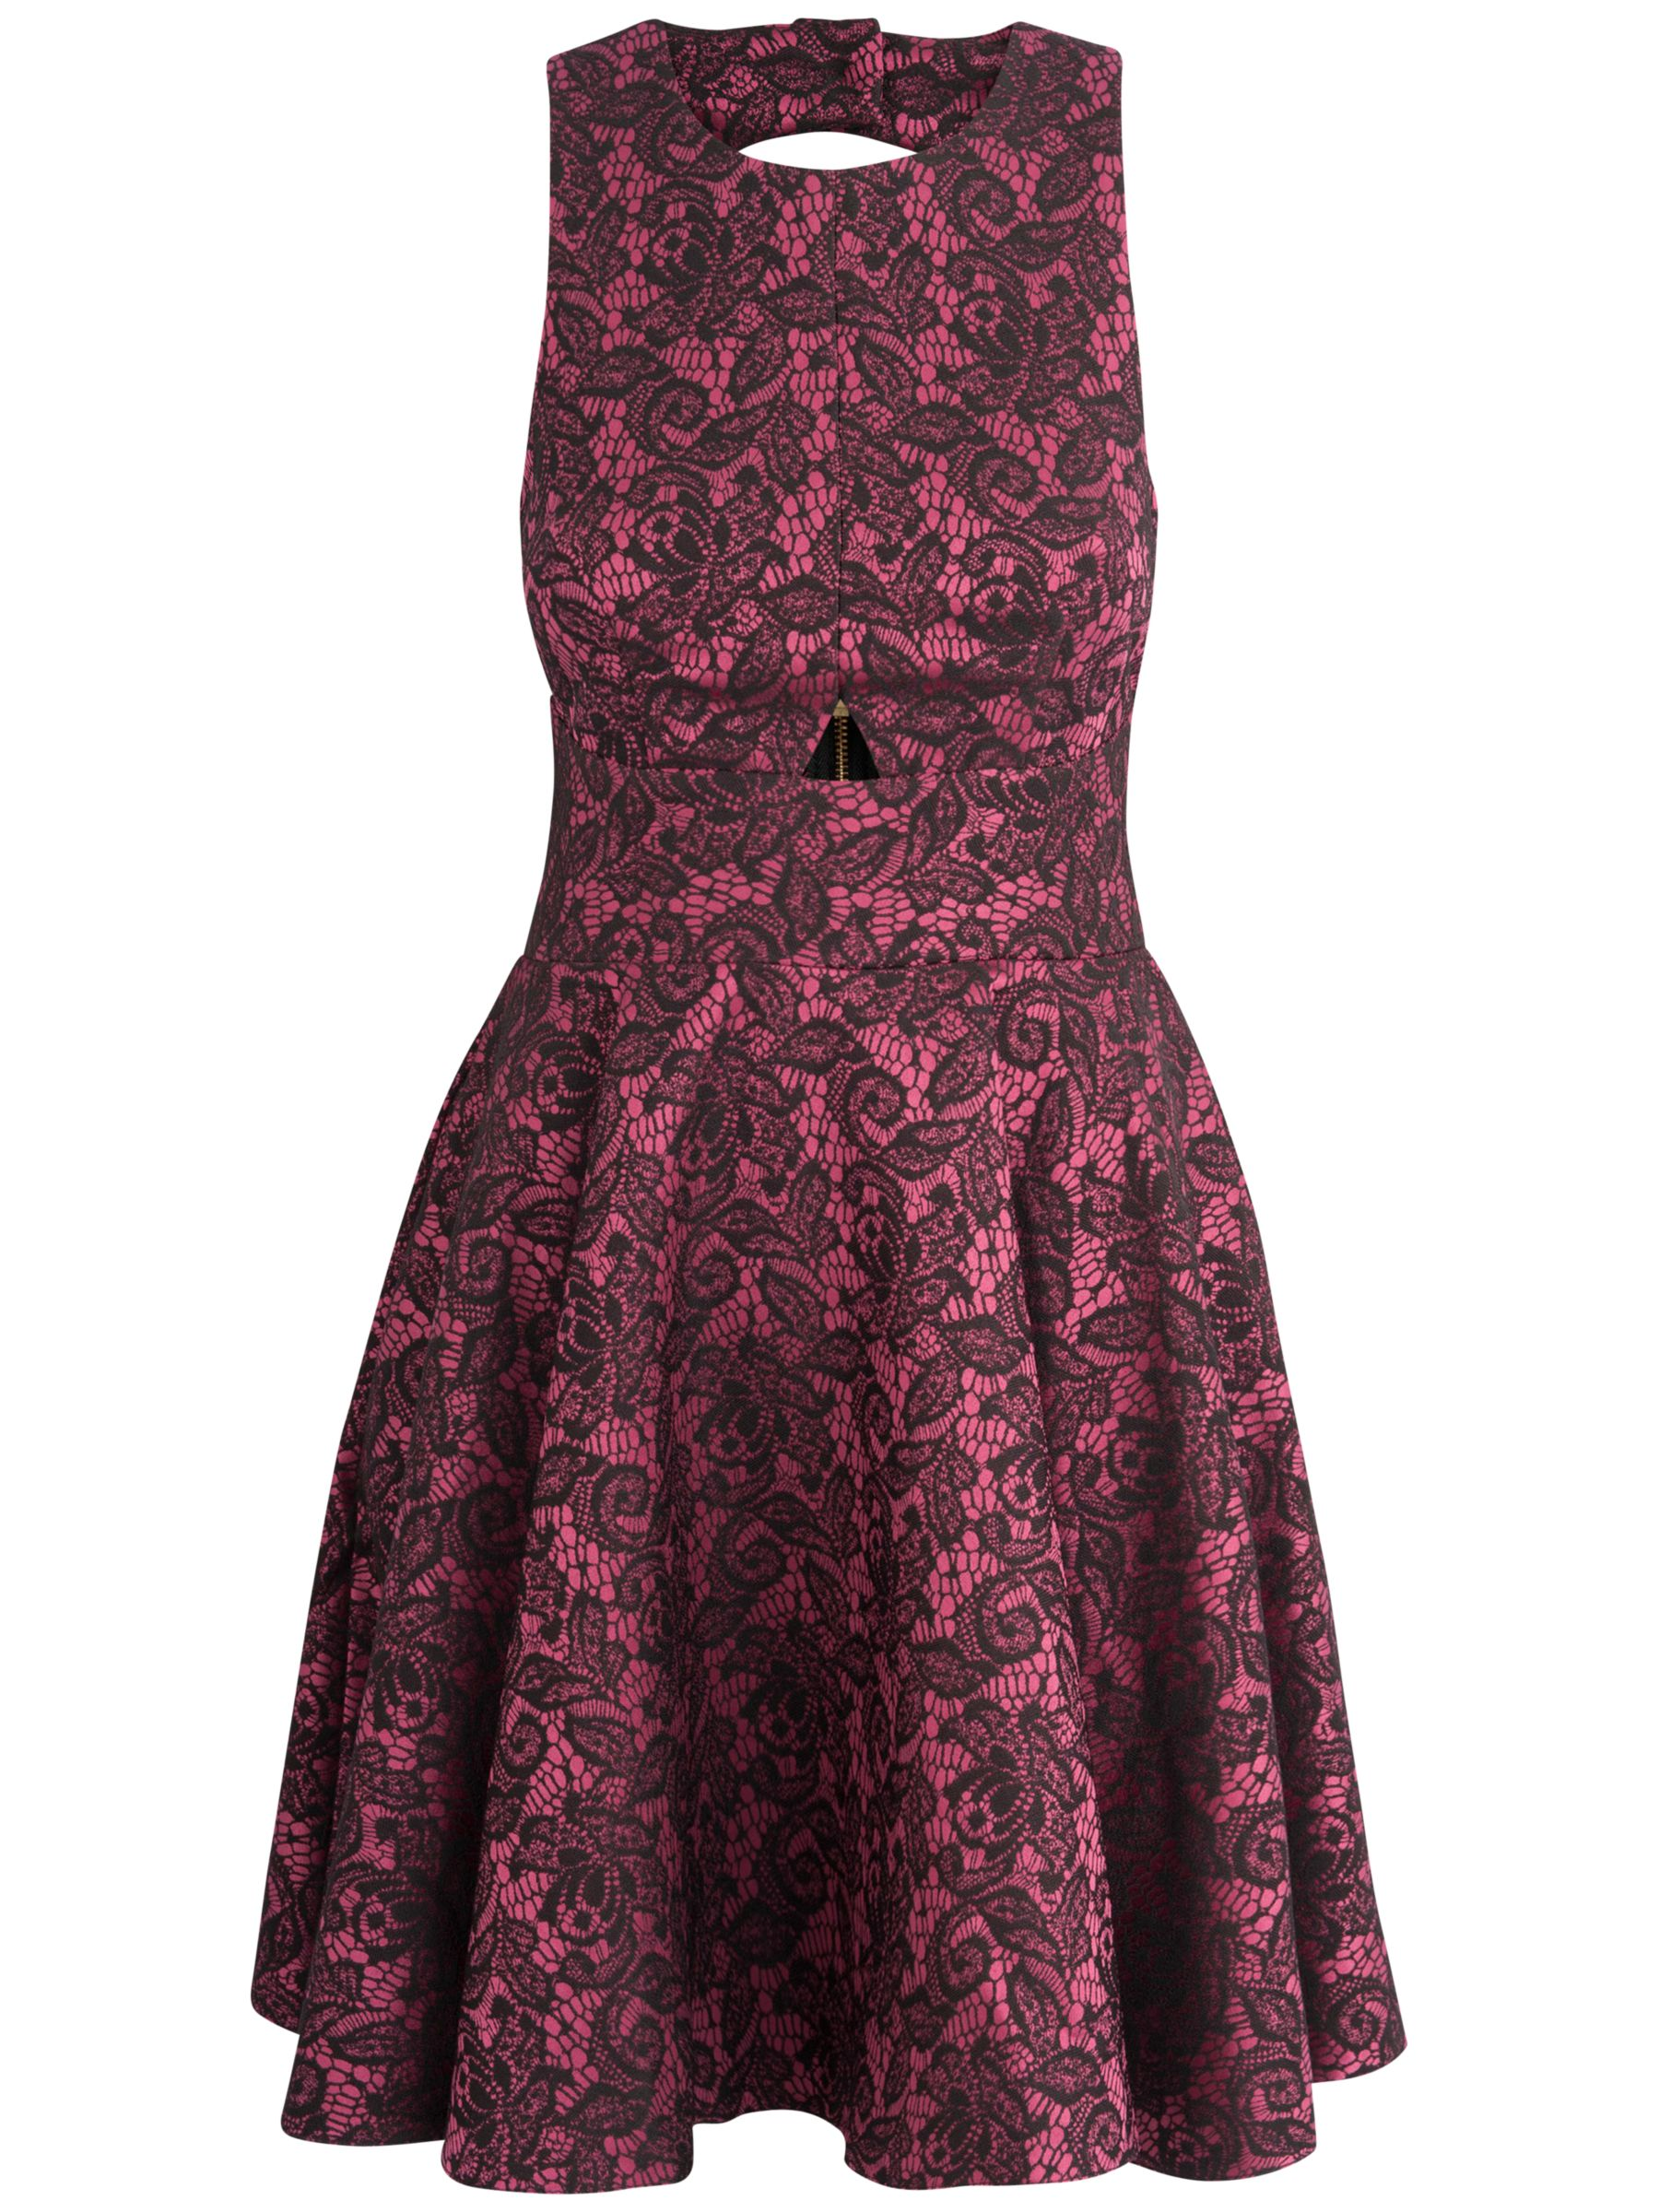 almari jacquard dress fuchsia, almari, jacquard, dress, fuchsia, 8 10 14 12, women, womens dresses, special offers, womenswear offers, womens dresses offers, 907073